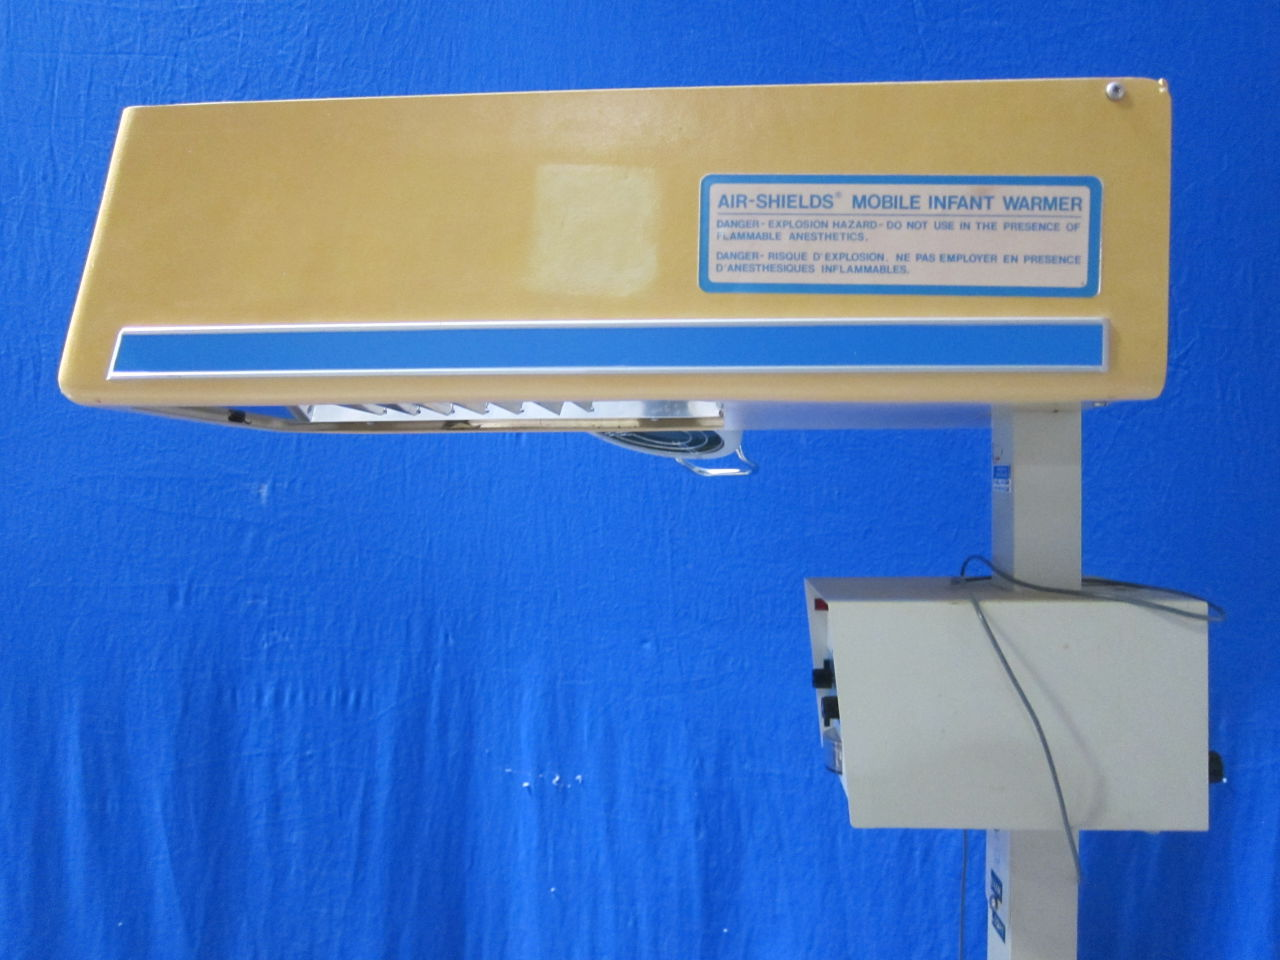 AIR-SHIELDS Various w/ Servo Controller Infant Warmer